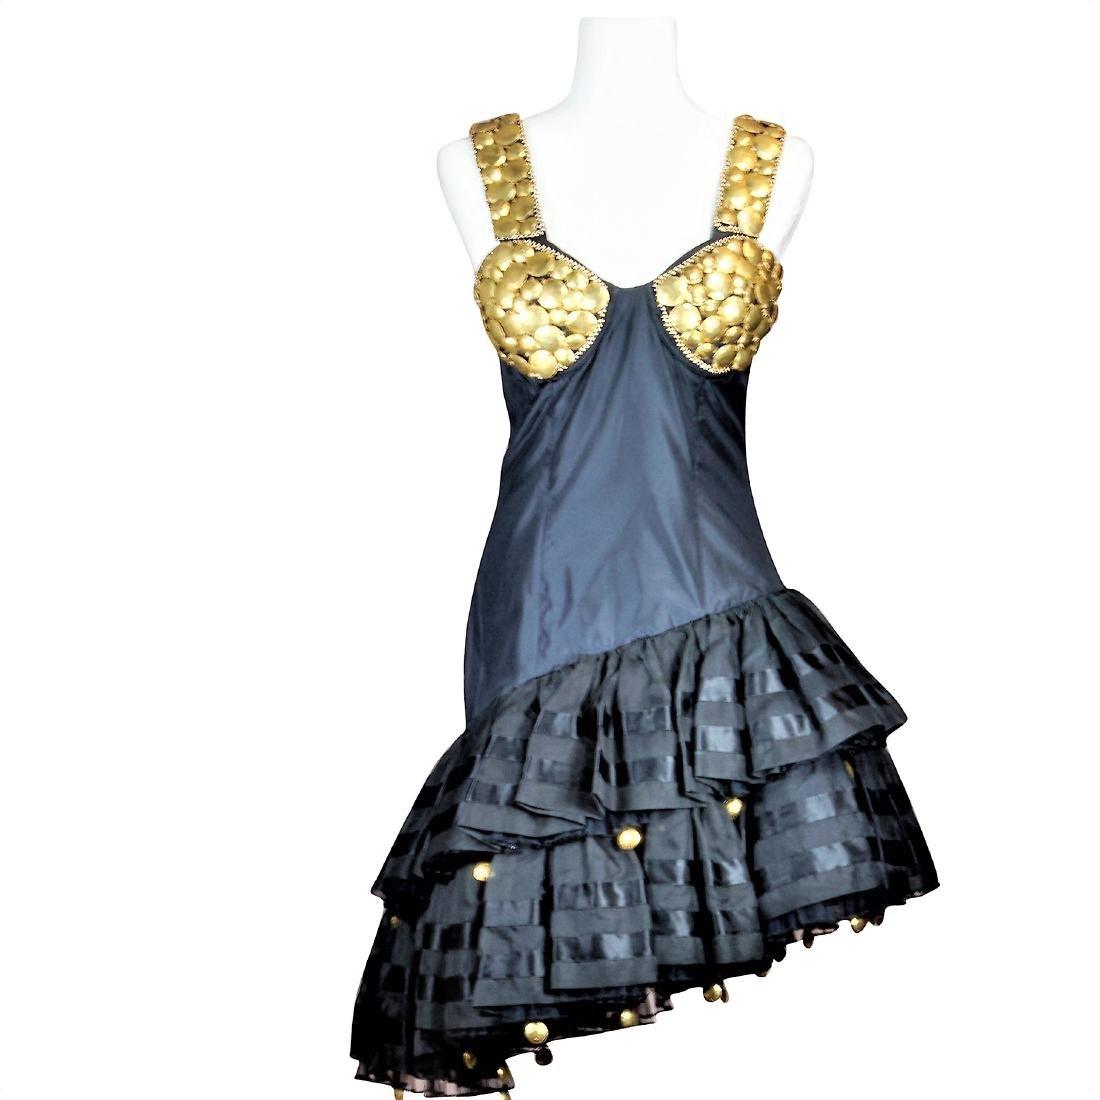 Original Gianni Versace Runway Atelier Black & Gold